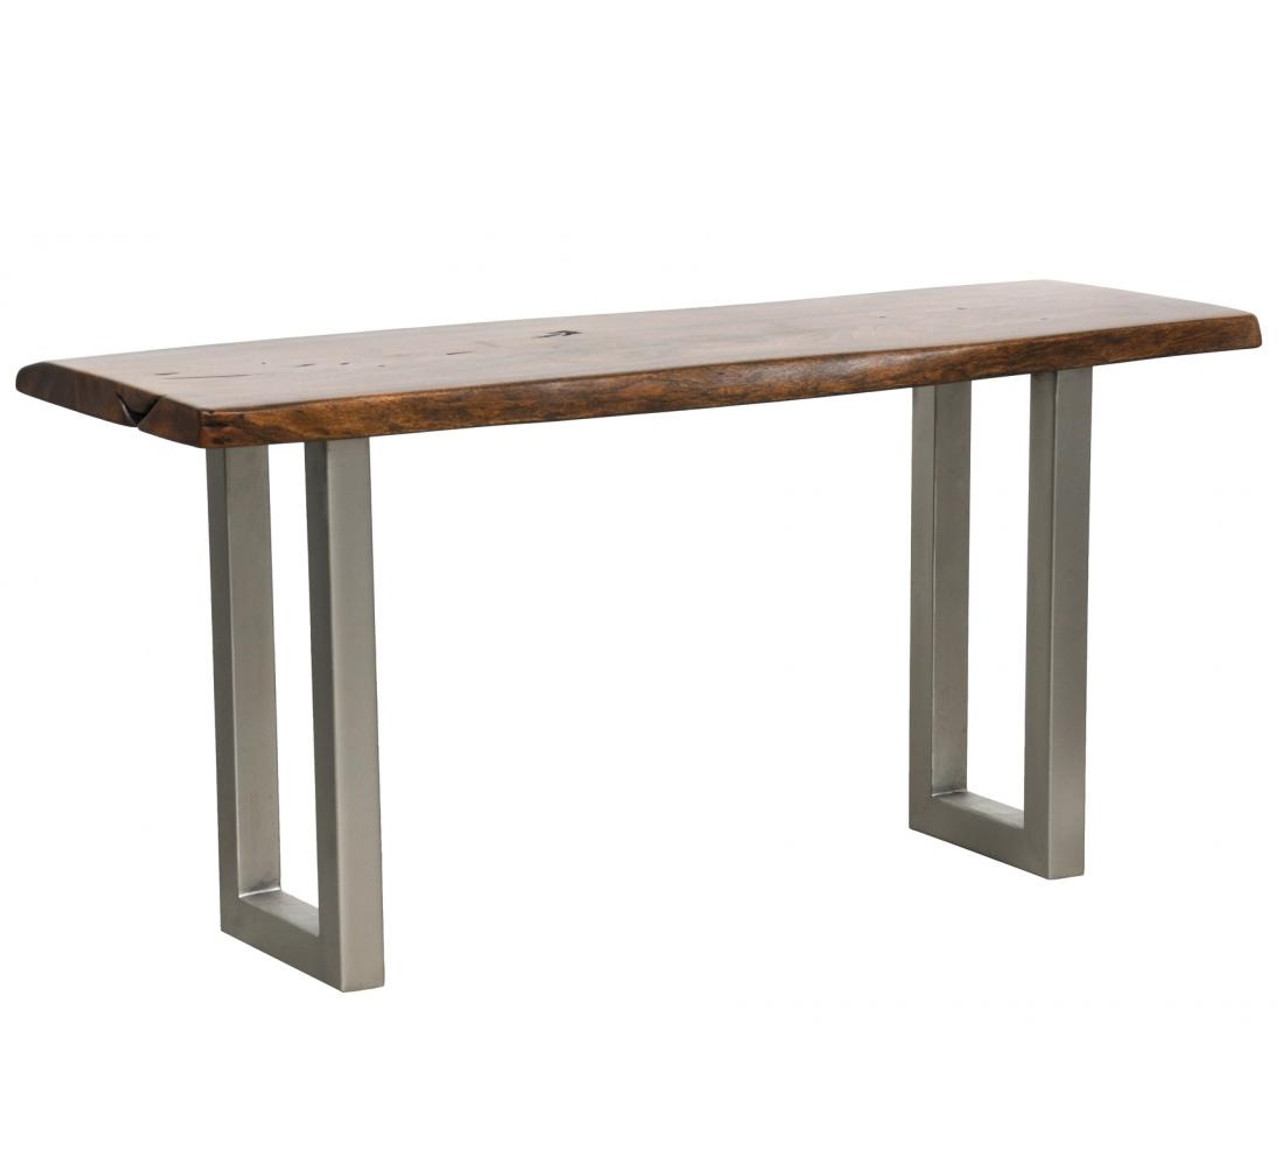 Montana solid wood metal leg console table zin home montana solid wood metal leg console table watchthetrailerfo